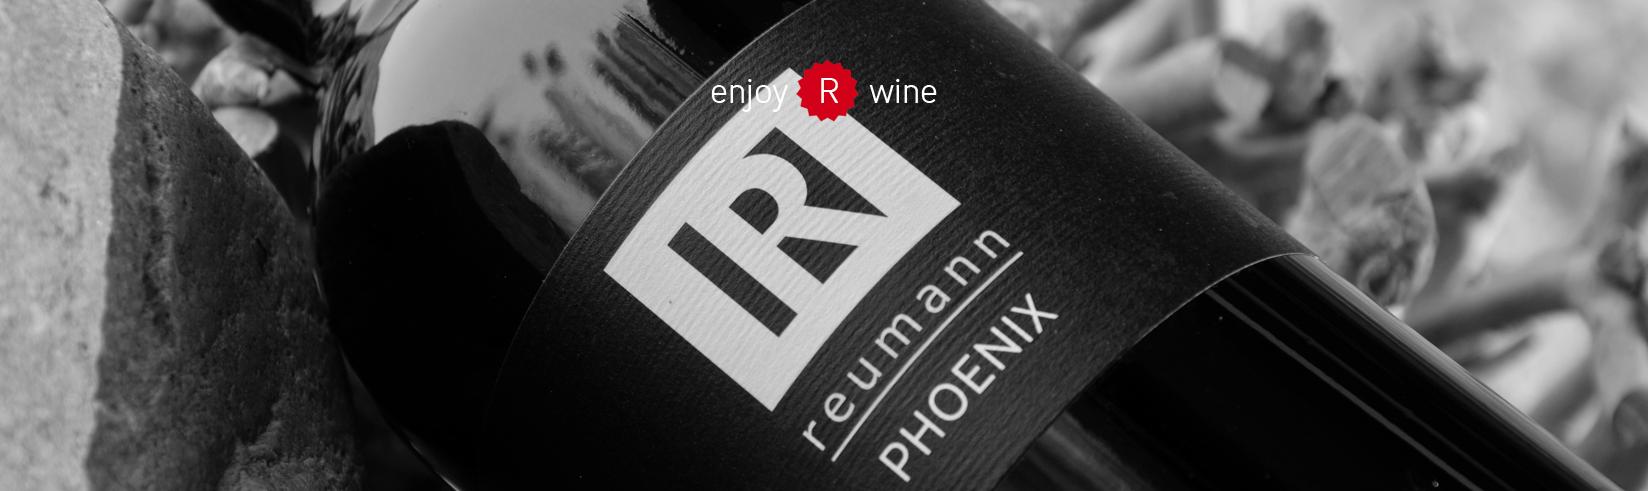 Flagship Wine Phoenix